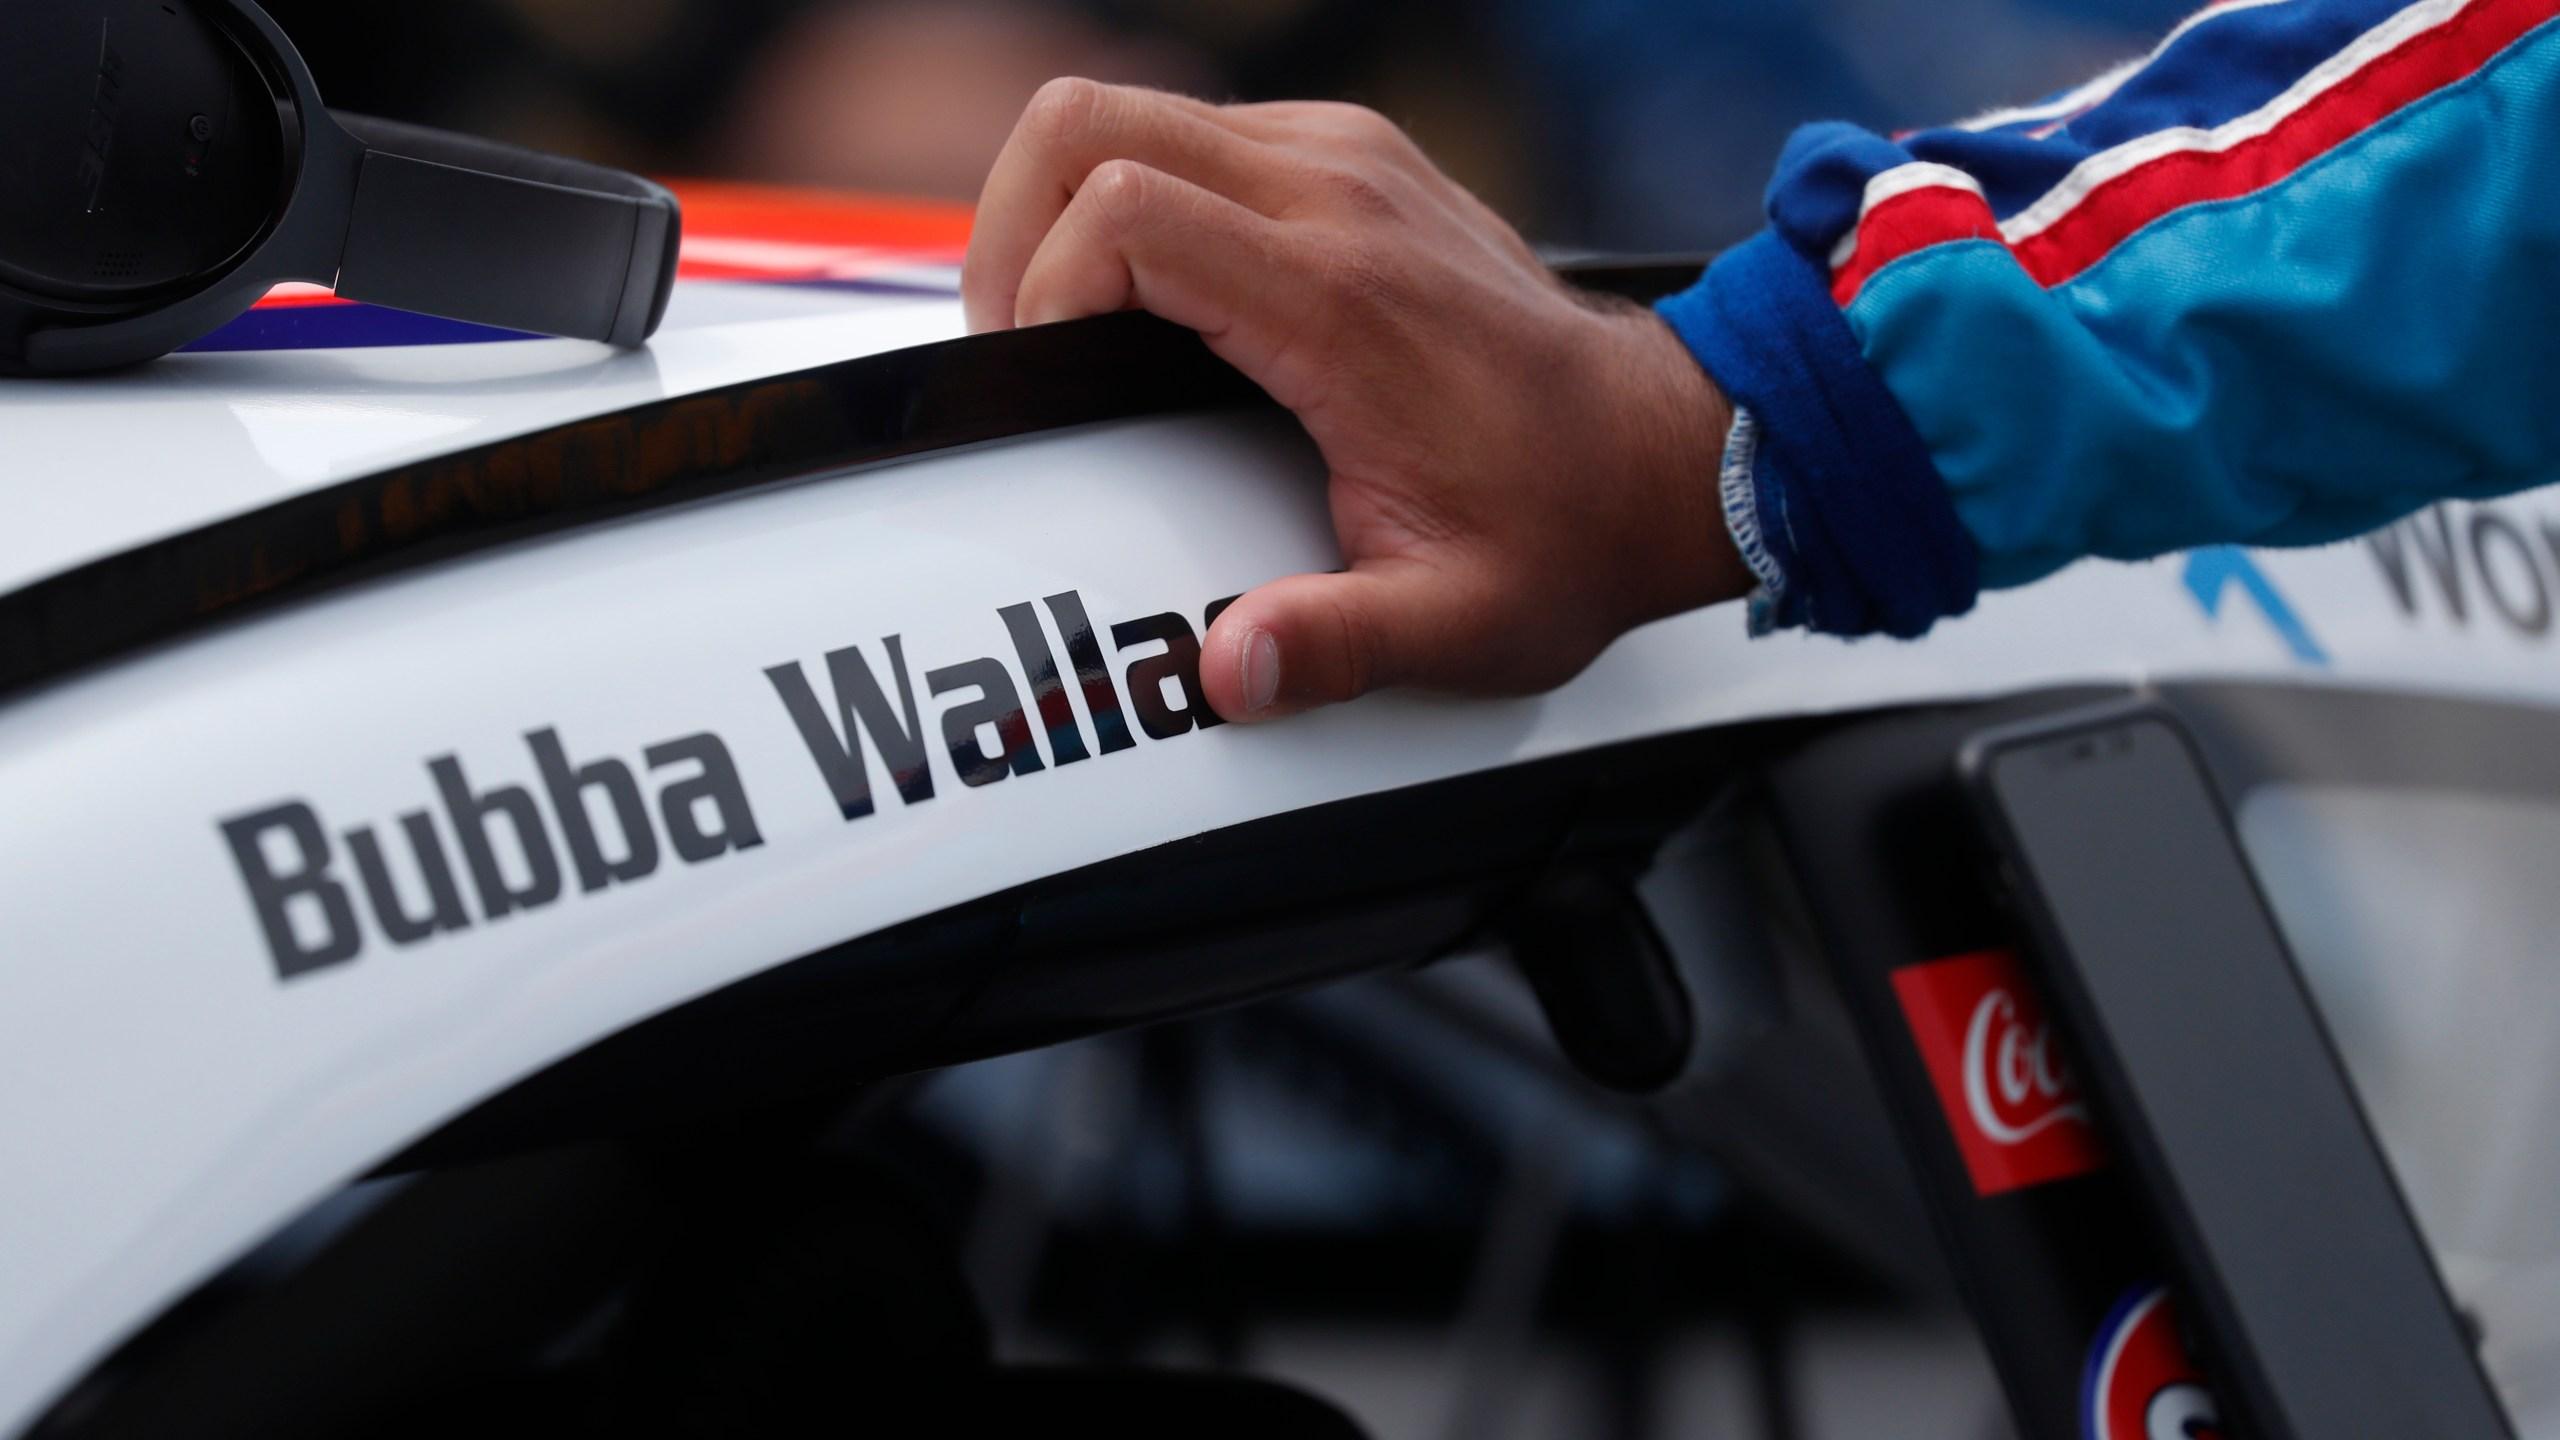 Bubba Wallace